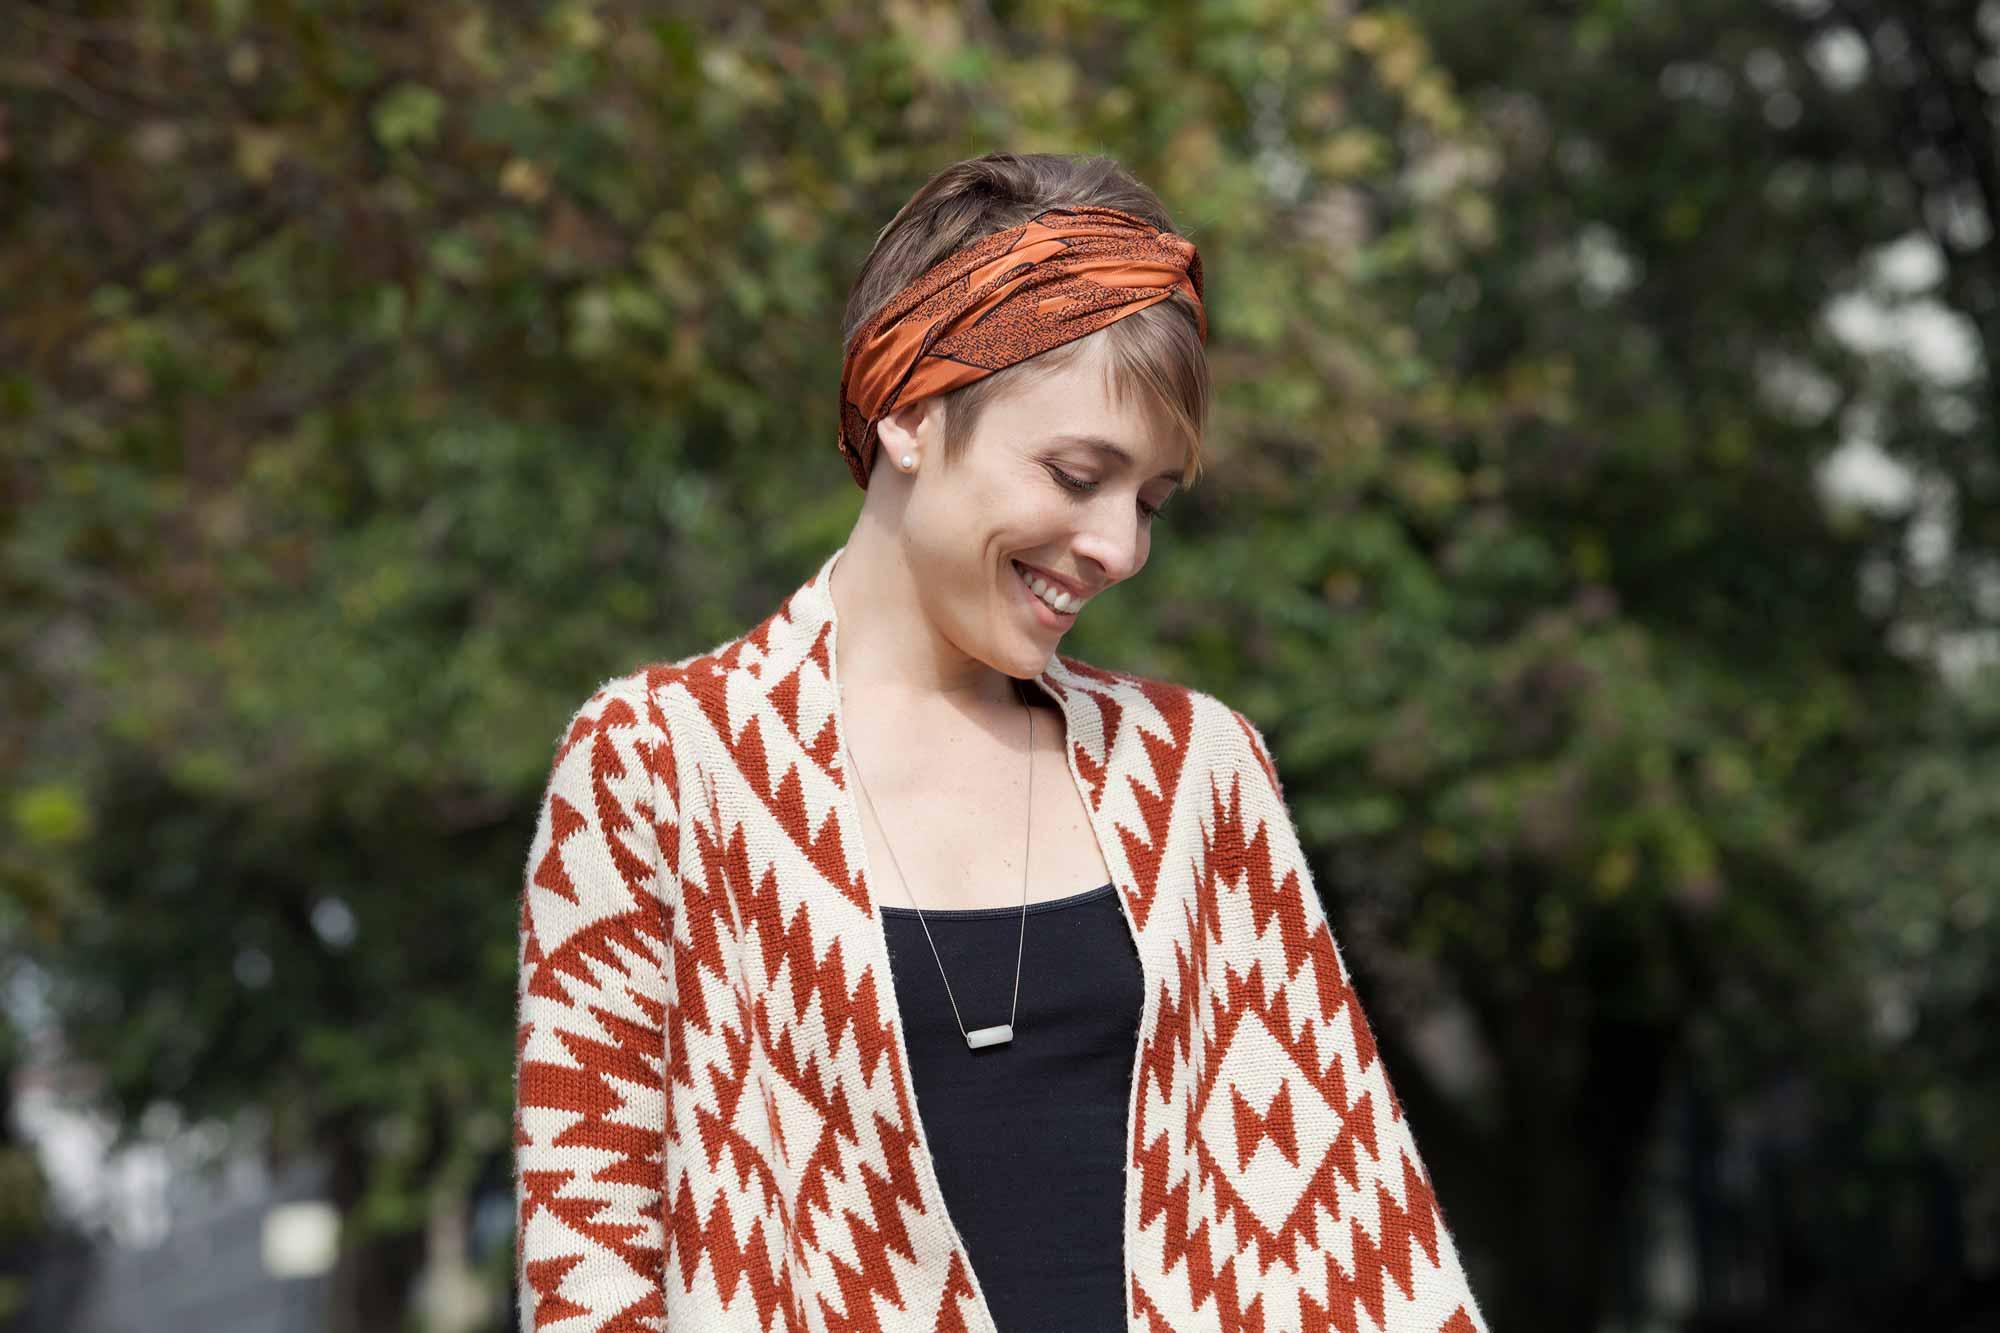 long pixie cut: All Things Hair - IMAGE - styling ideas brown hair bandana hair accessory